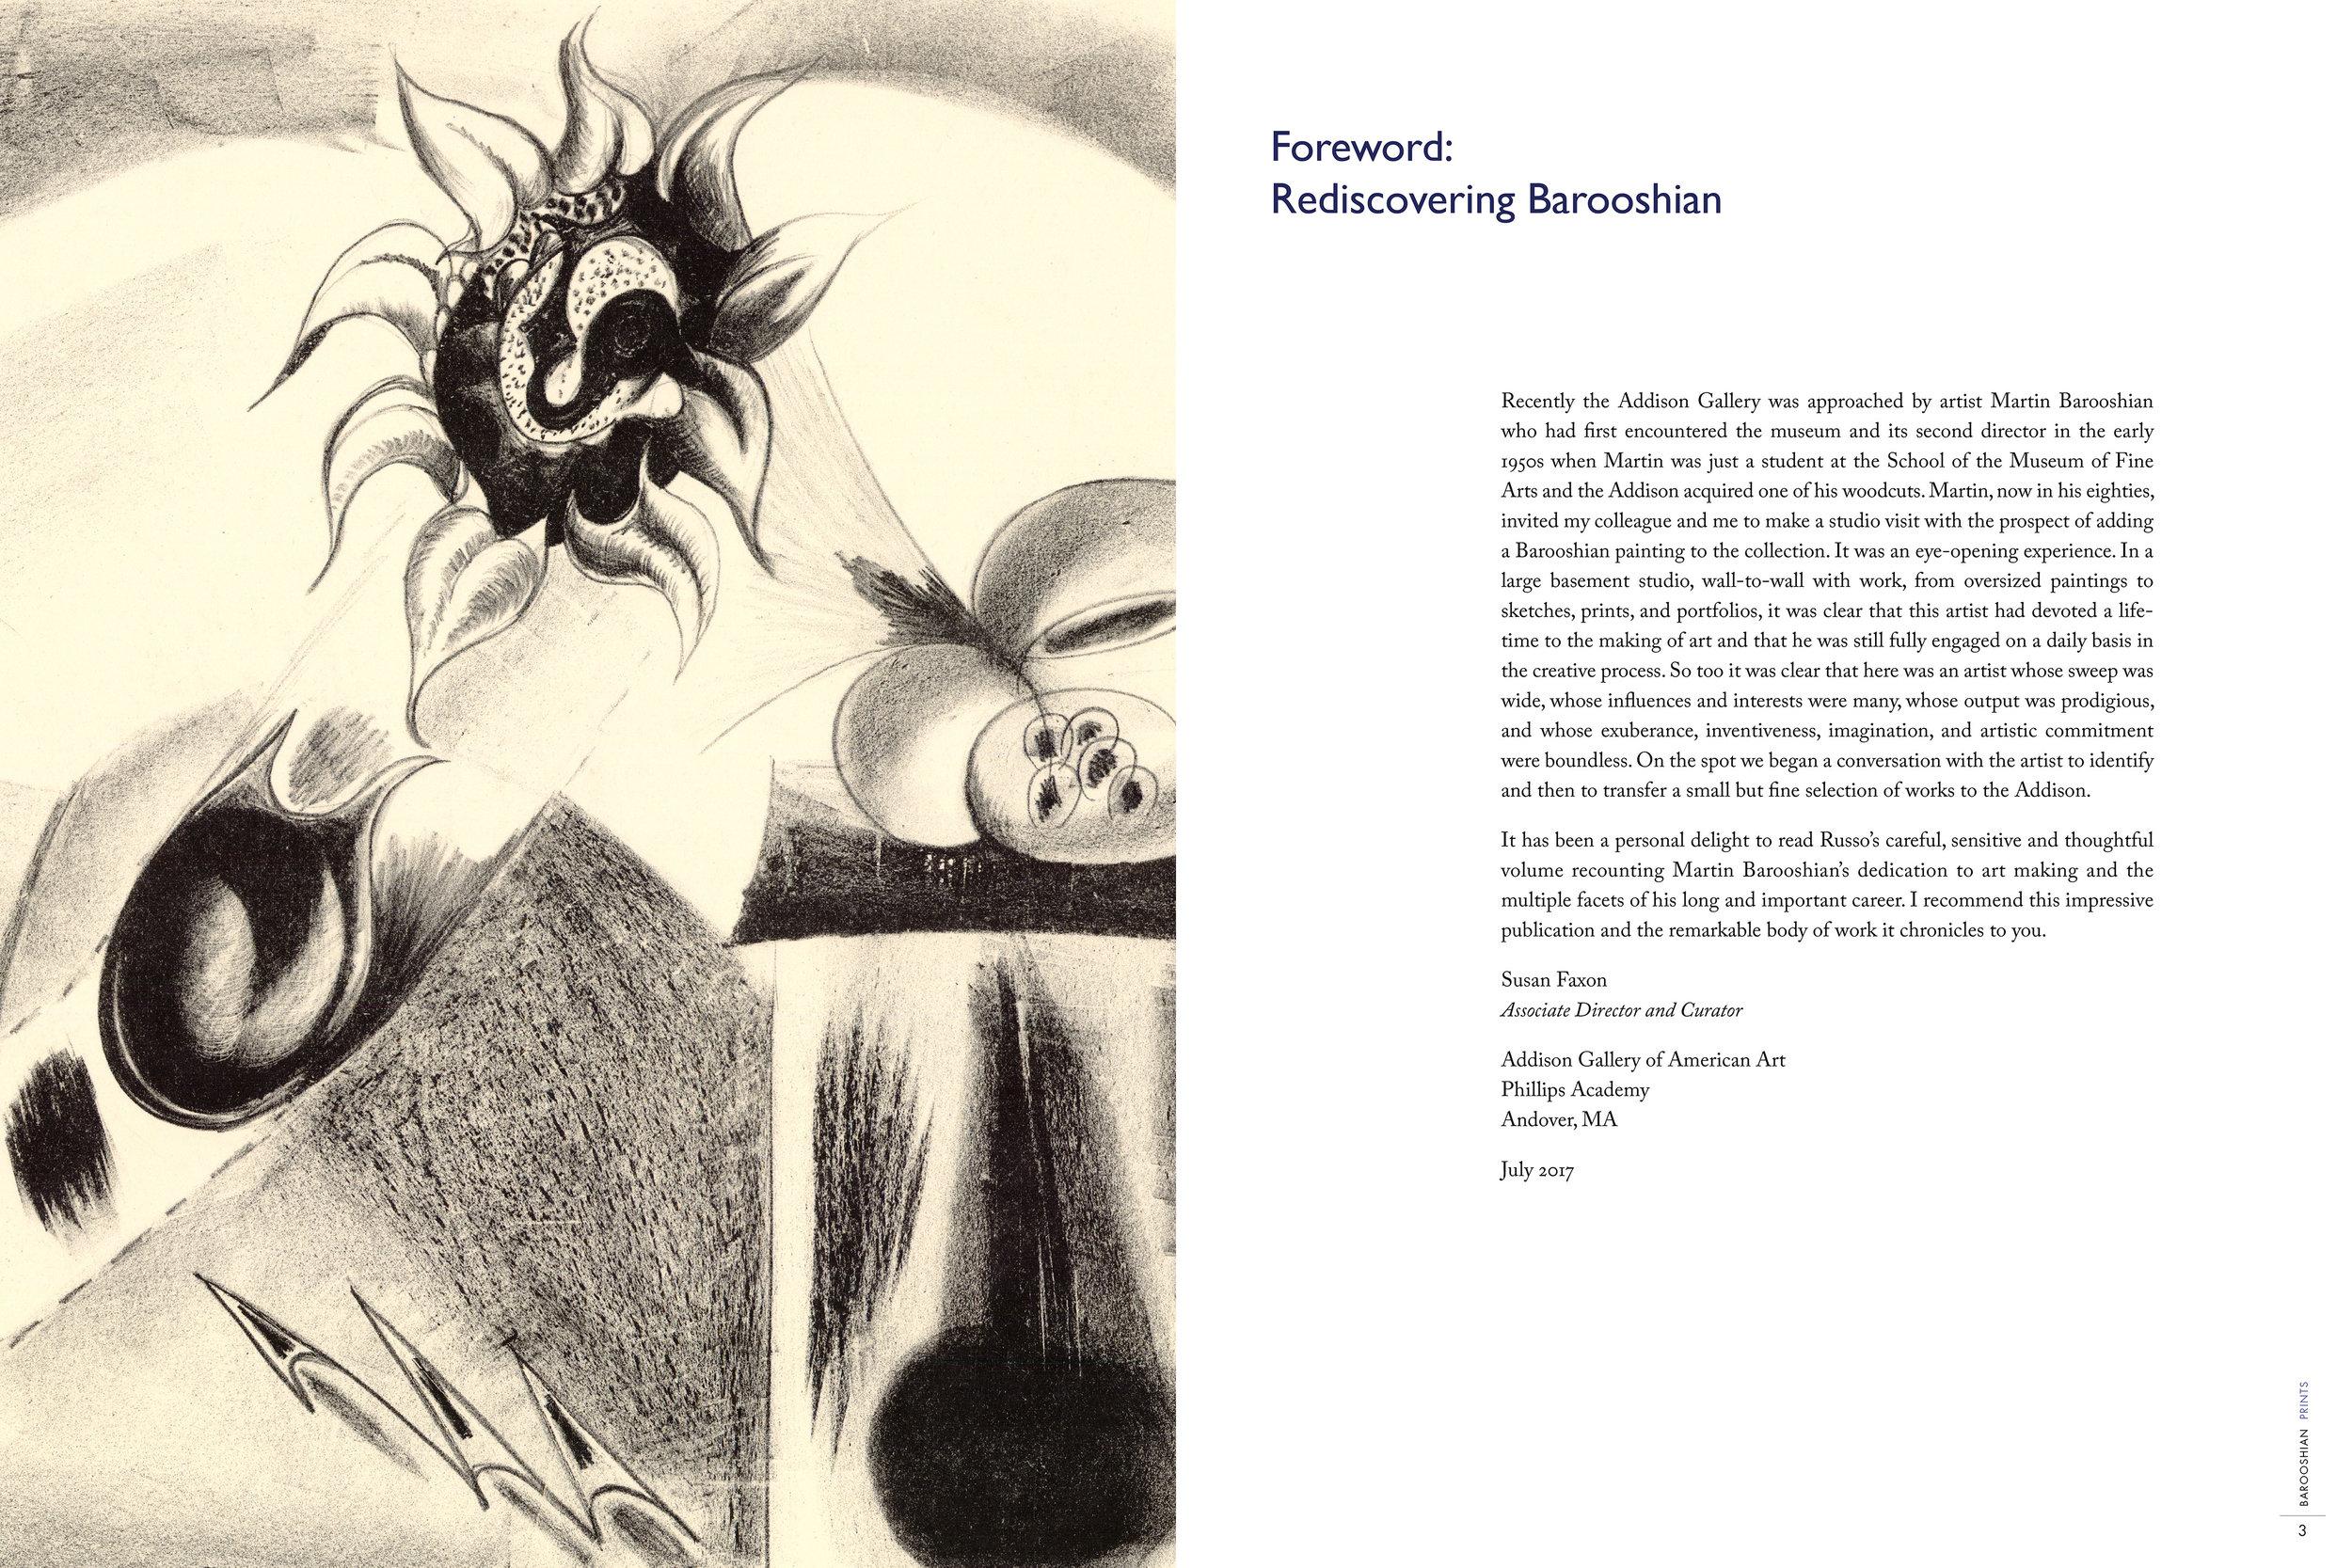 Barooshian_book-tbd-pp2-3lrgmed.jpg